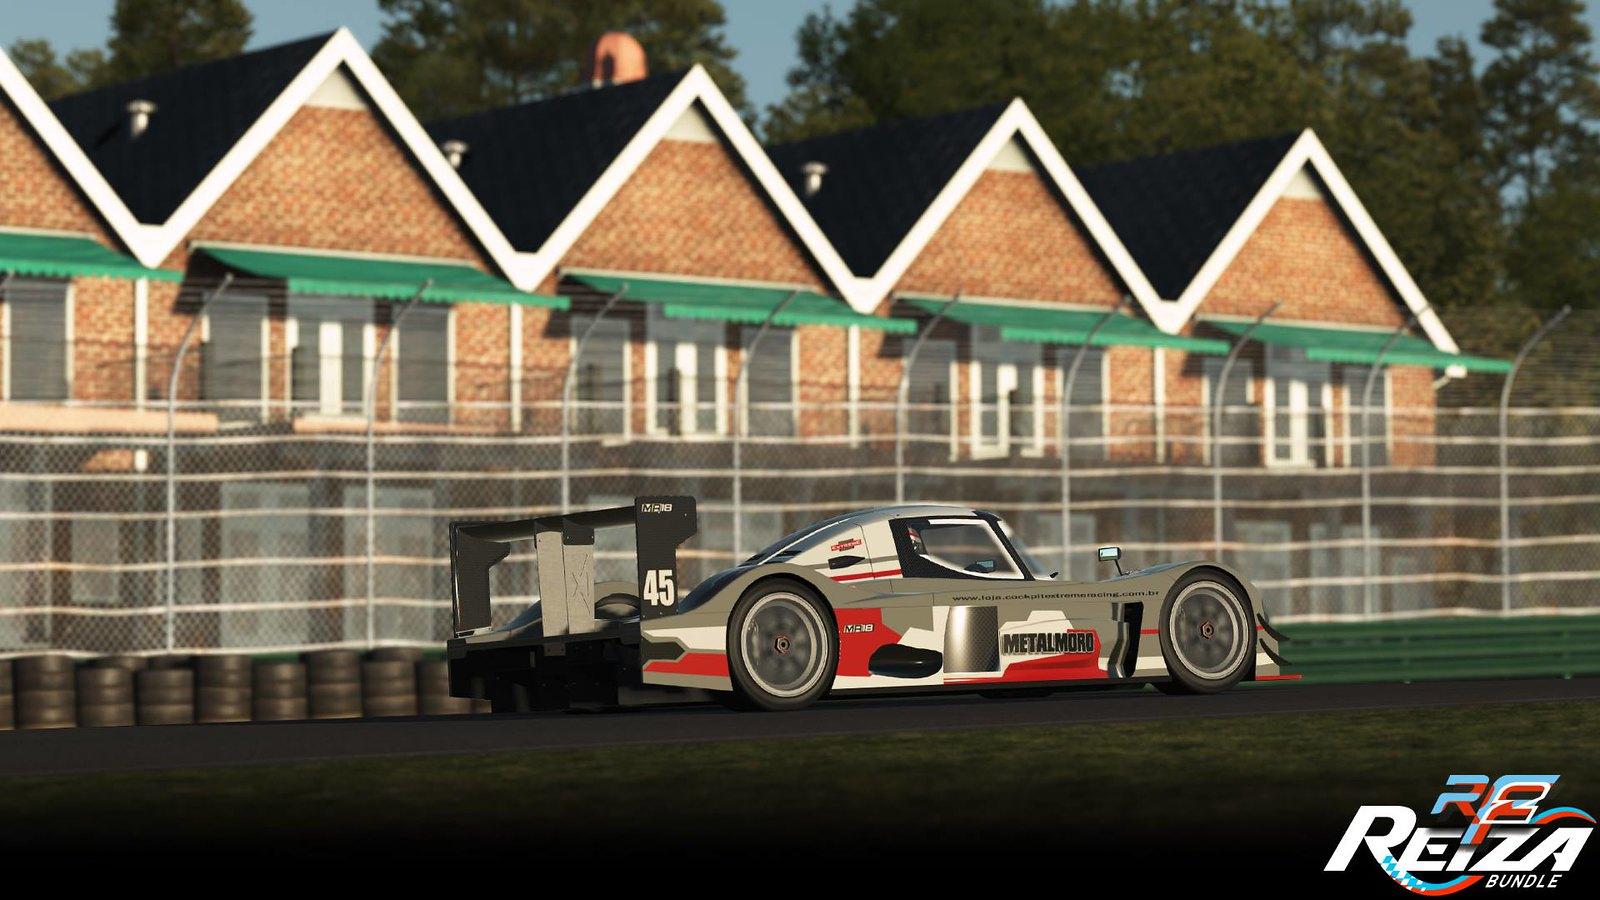 rFactor 2 - Reiza Bundle DLC VIRginia International Raceway Previews 4